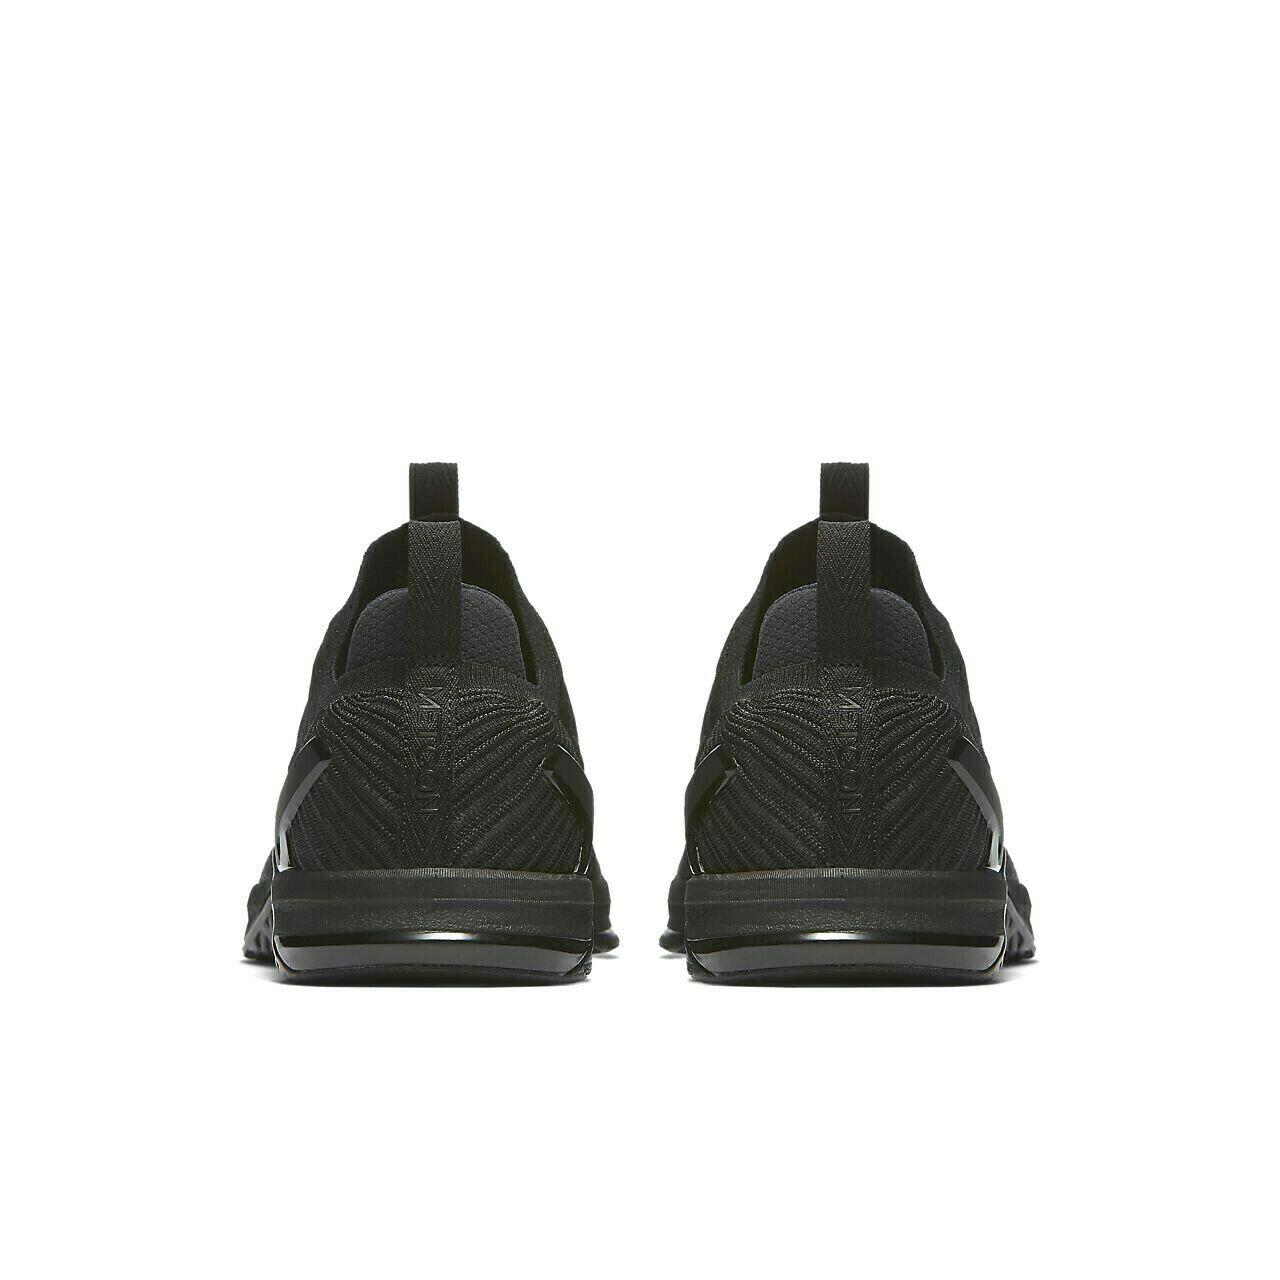 Nike Metcon DSX Flyknit 2 Triple Black Crossfit Training Shoes 924423-004 image 5